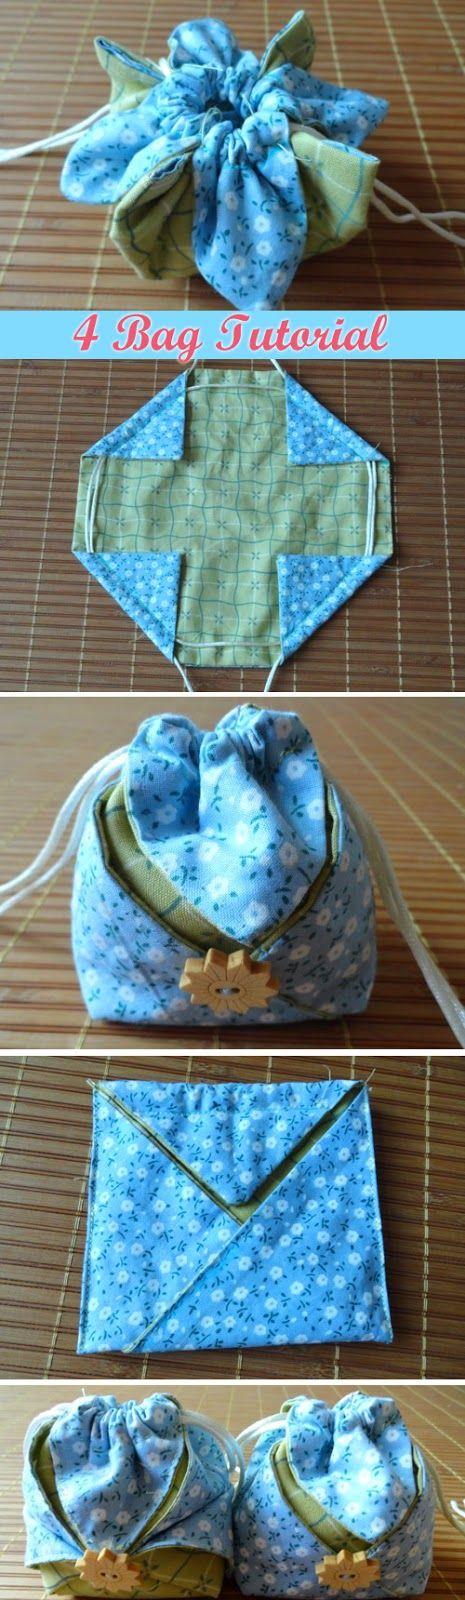 DIY Des pochettes Omiyage pour des cadeaux dans autre chose que du papier. (Gift Drawstring Bags, Little Pouches. 4 Sewing Variant Photo Tutorial) (http://www.handmadiya.com/2016/02/omiyage-gift-pouch-4-tutorial.html)